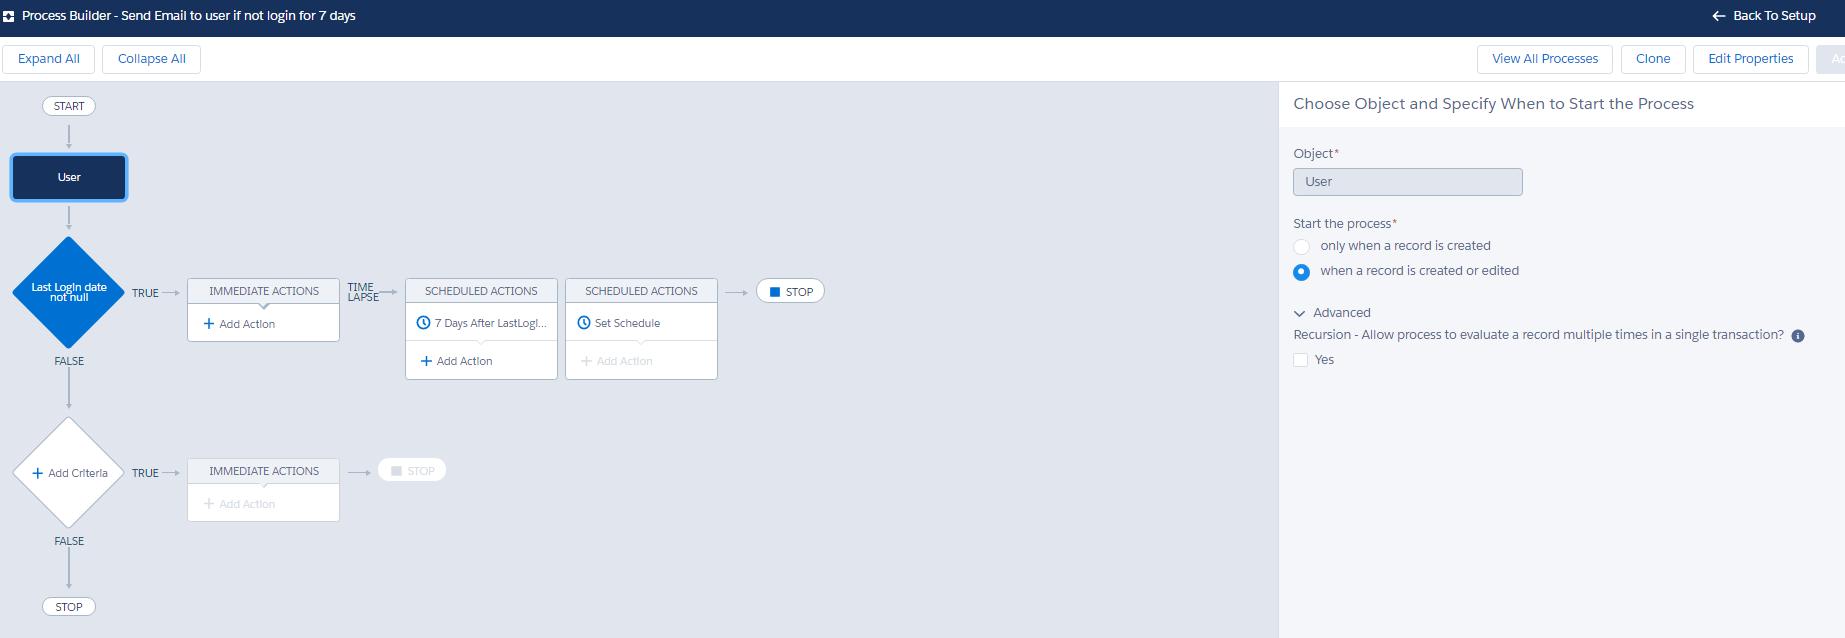 Use process builder for sending user-based email alert on